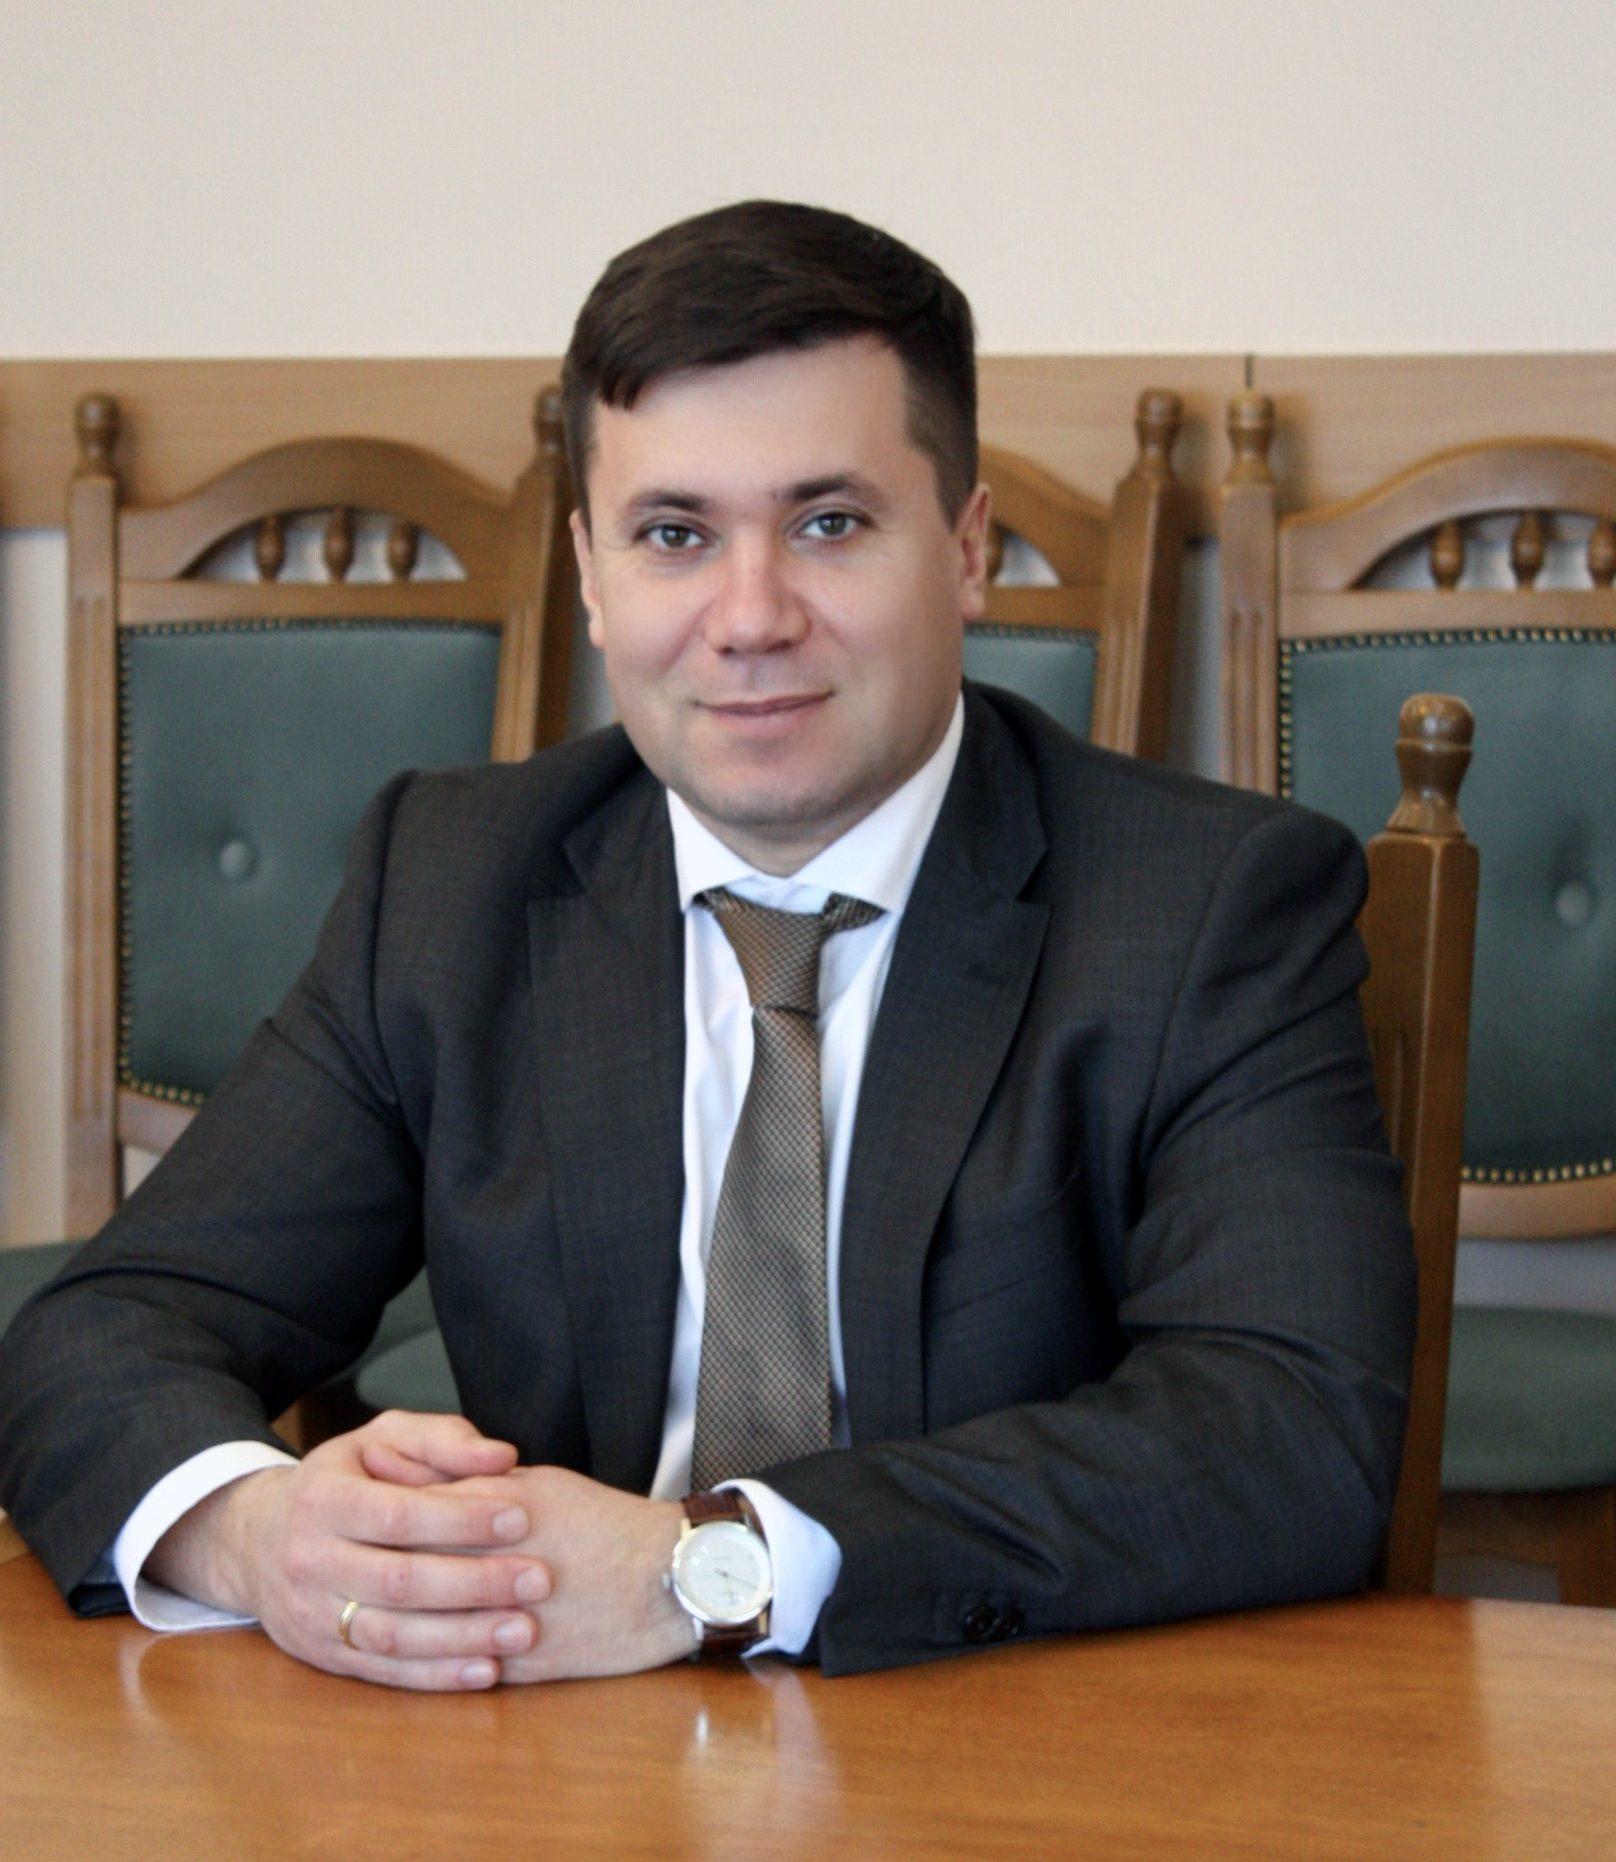 Вітренко Андрій Олександрович — Faculty of Economics of Taras Shevchenko  National University of Kyiv